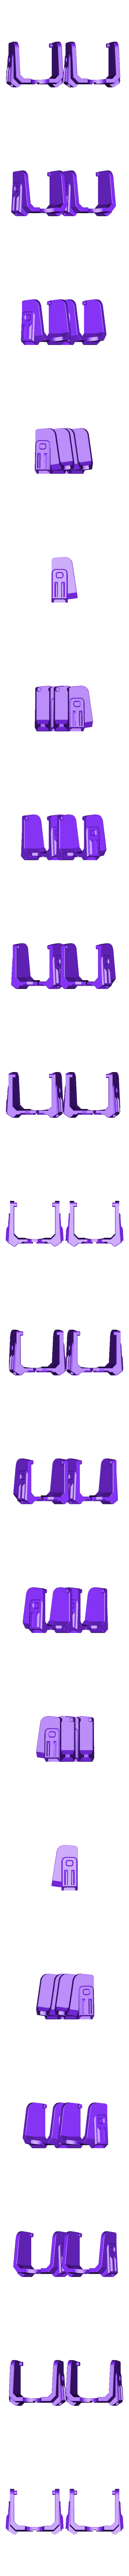 64_Drag_Leg14_AnkleCover_GREY.stl Download STL file ARTICULATED DRAGONLORD (not Dragonzord) - NO SUPPORT • 3D printer model, Toymakr3D